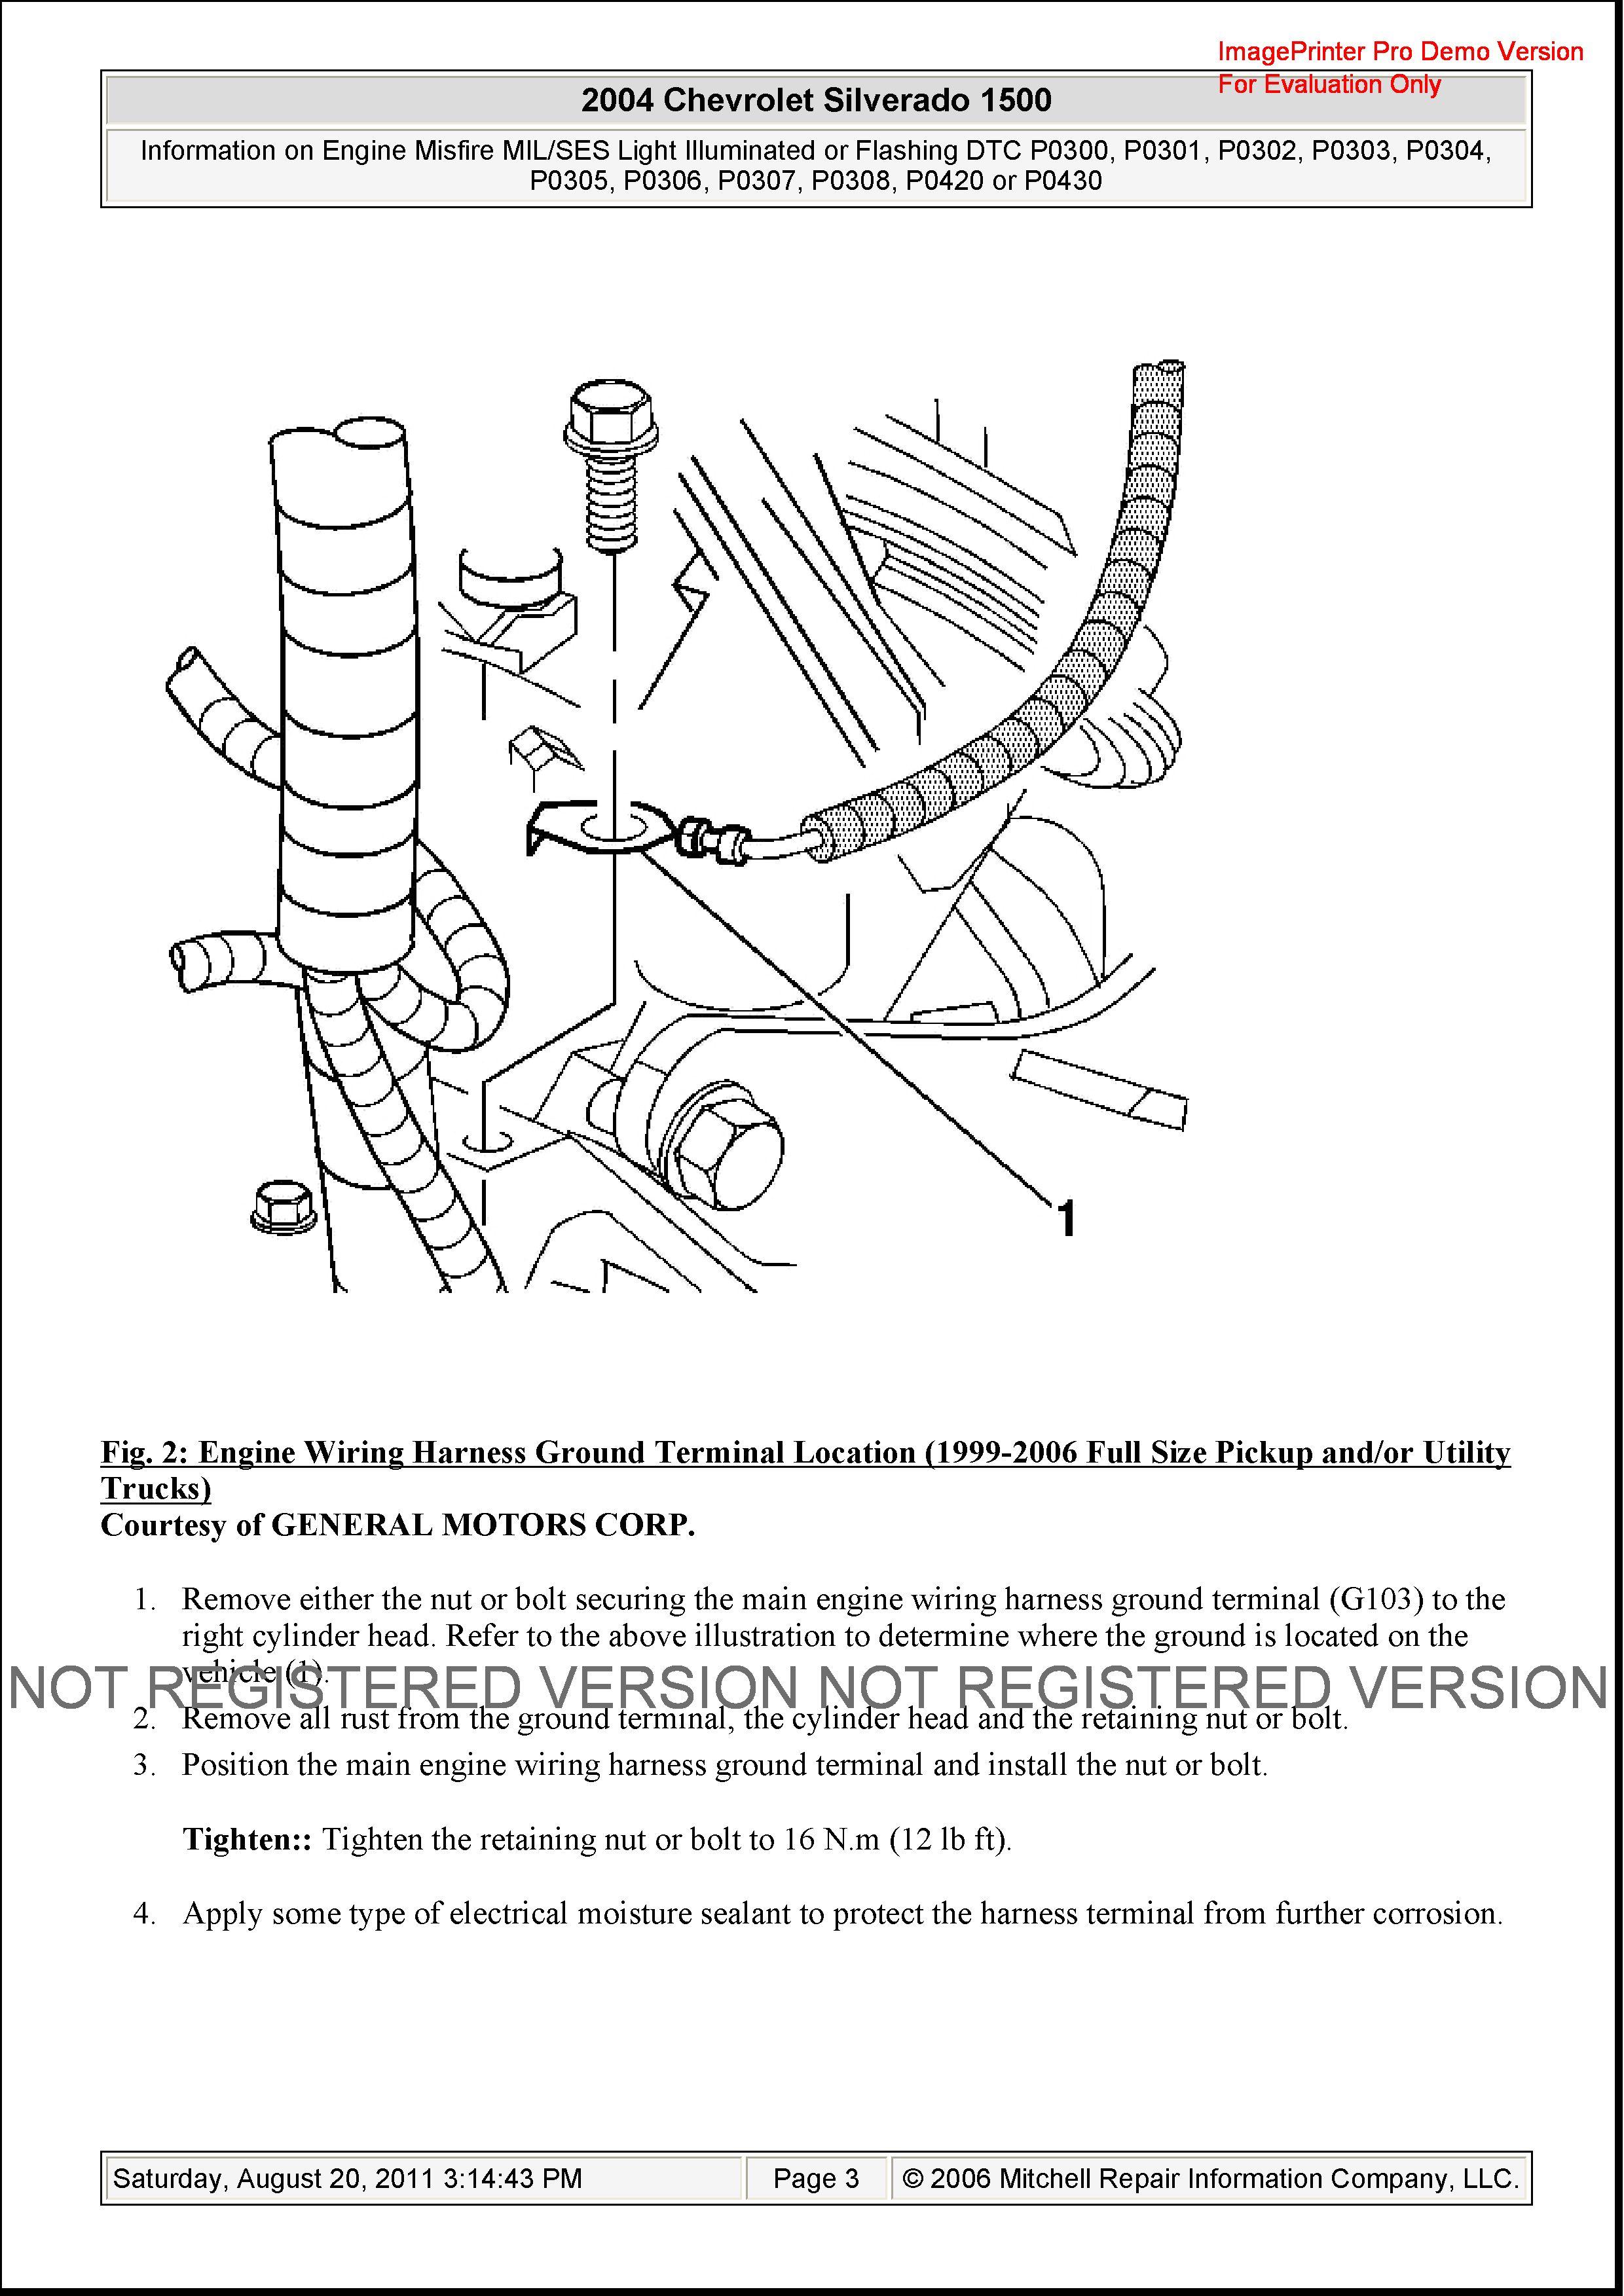 I have a PO300 code on my 2004 Silverado 6 0L engine